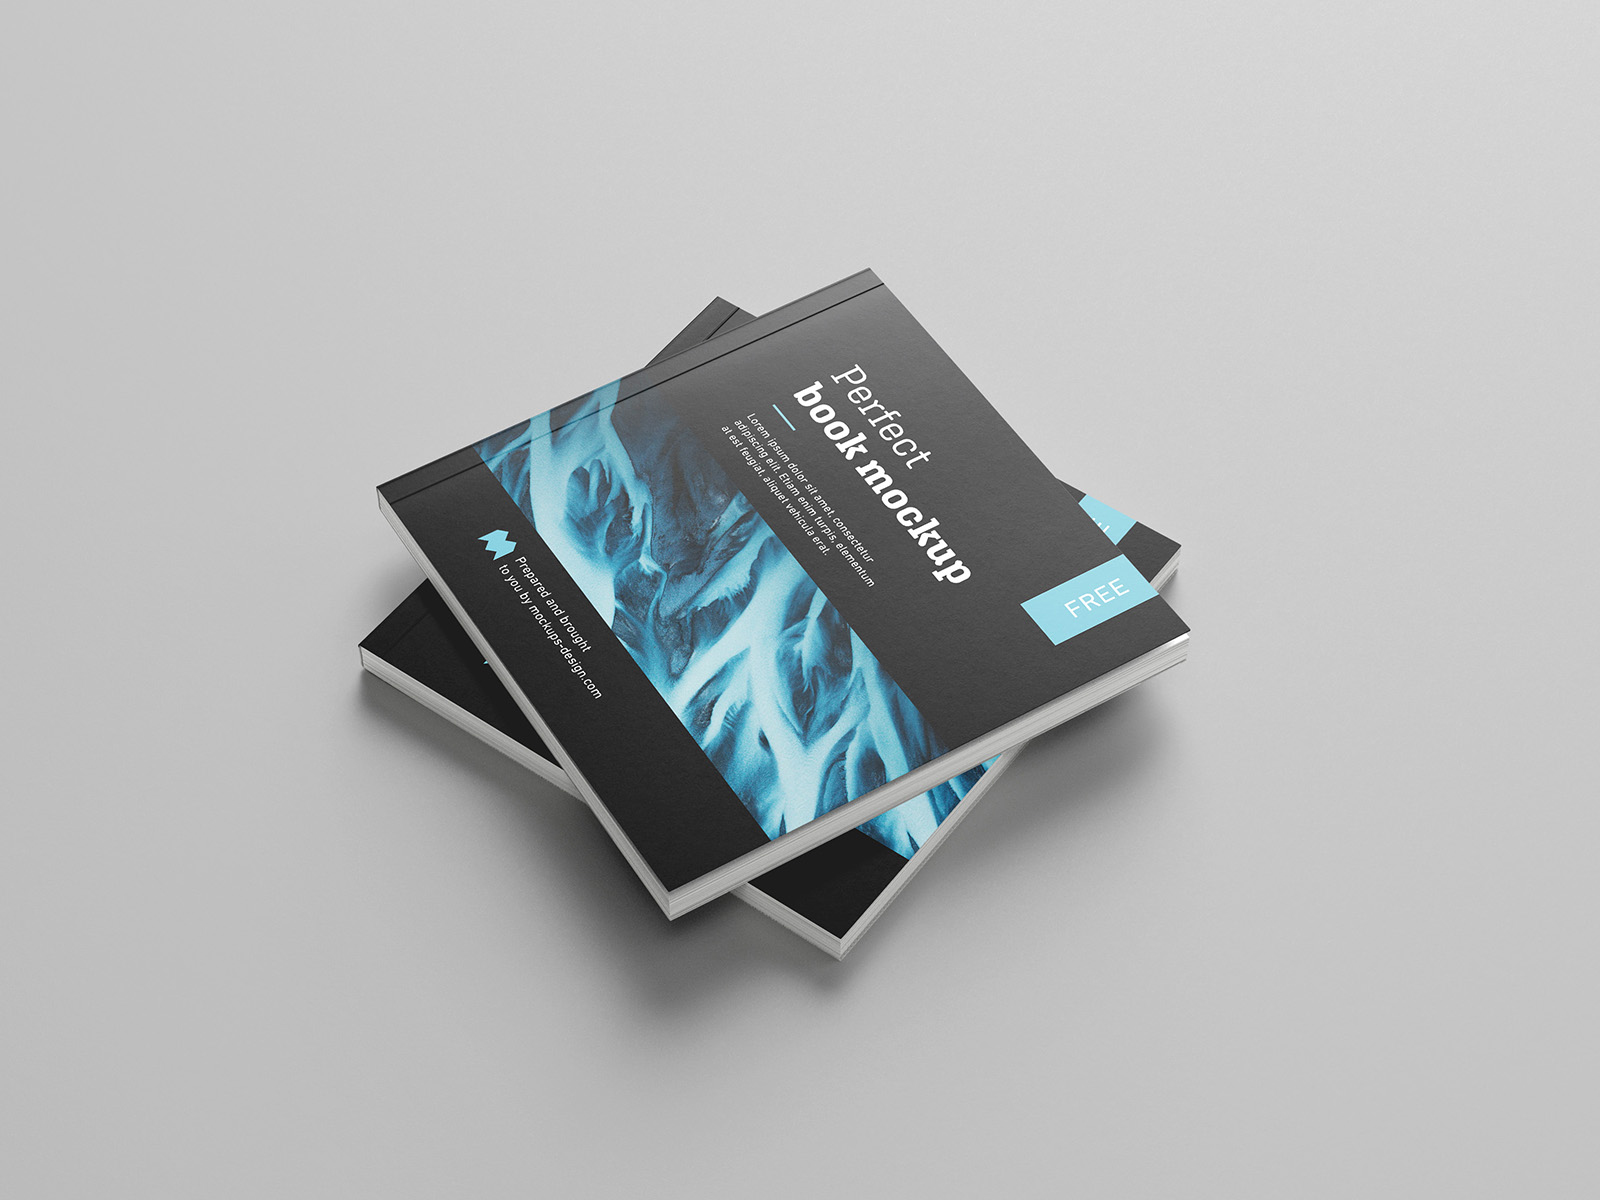 Free Square Book Catalog Mockup